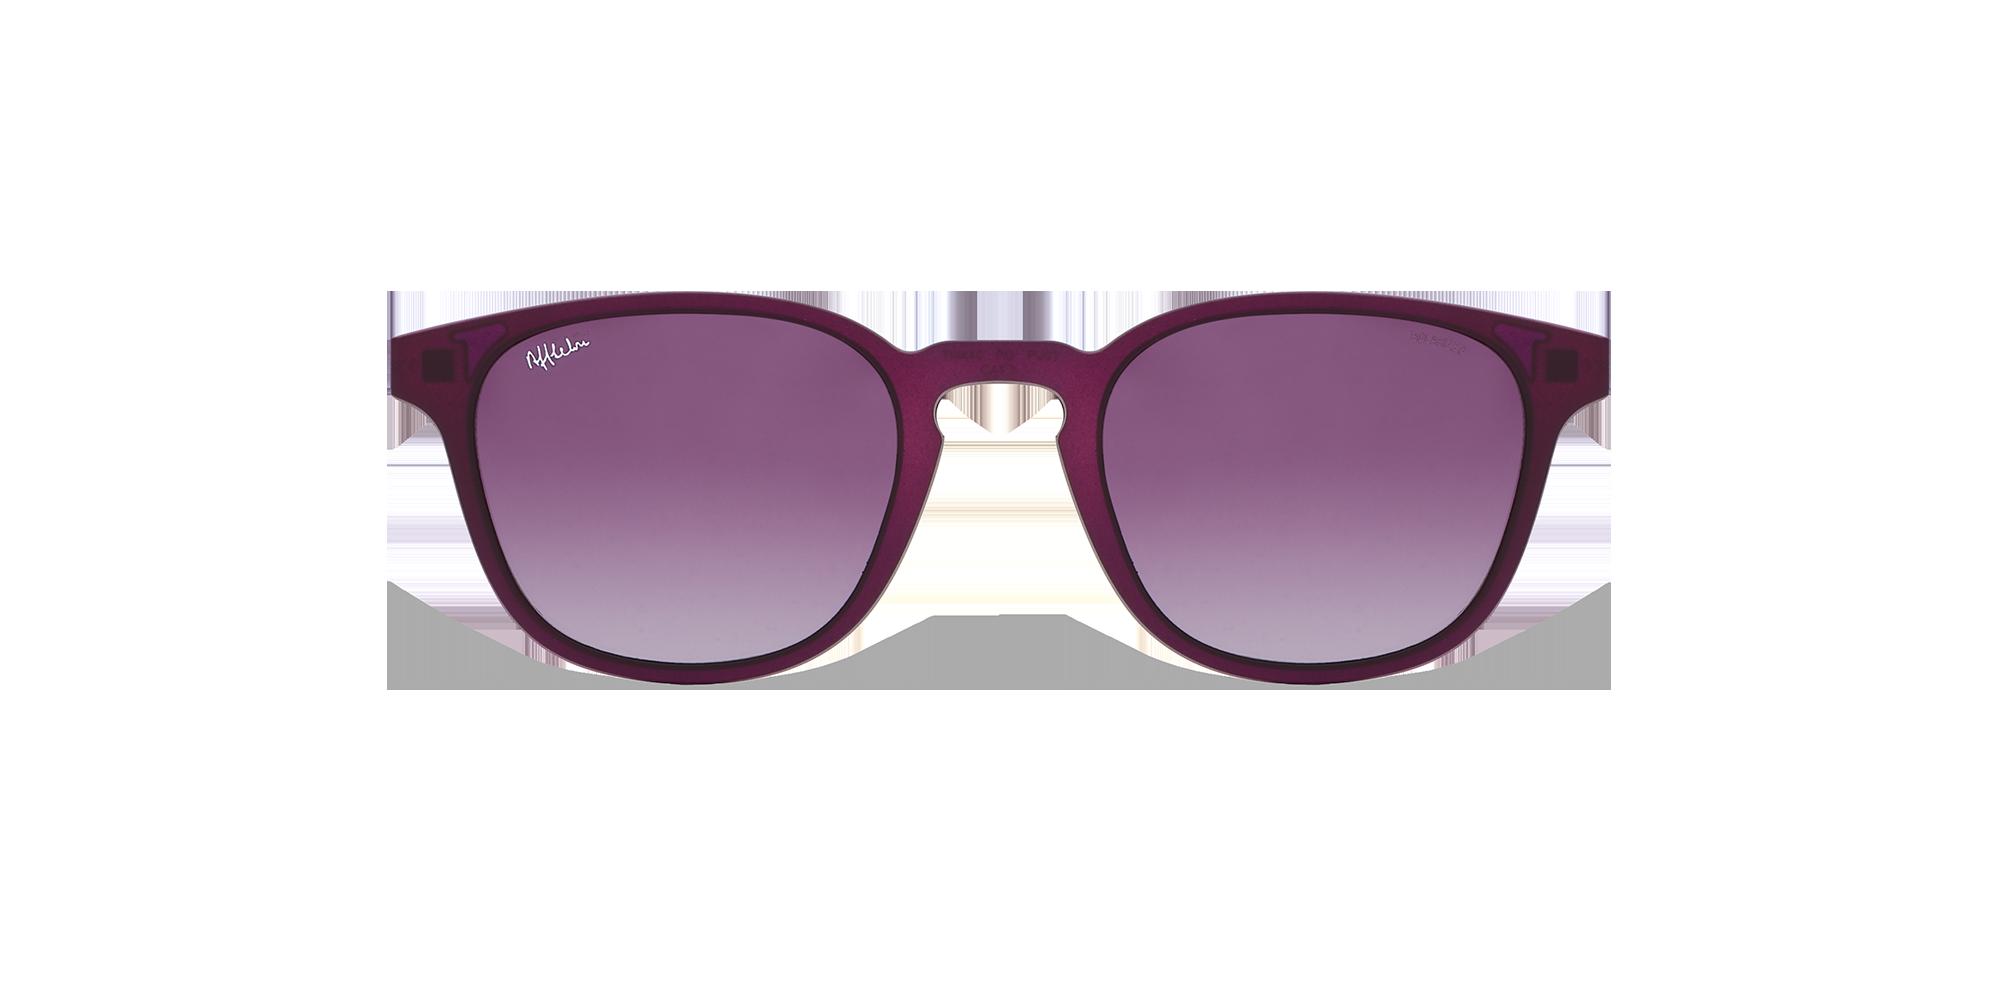 afflelou/france/products/smart_clip/clips_glasses/07630036429174_face.png